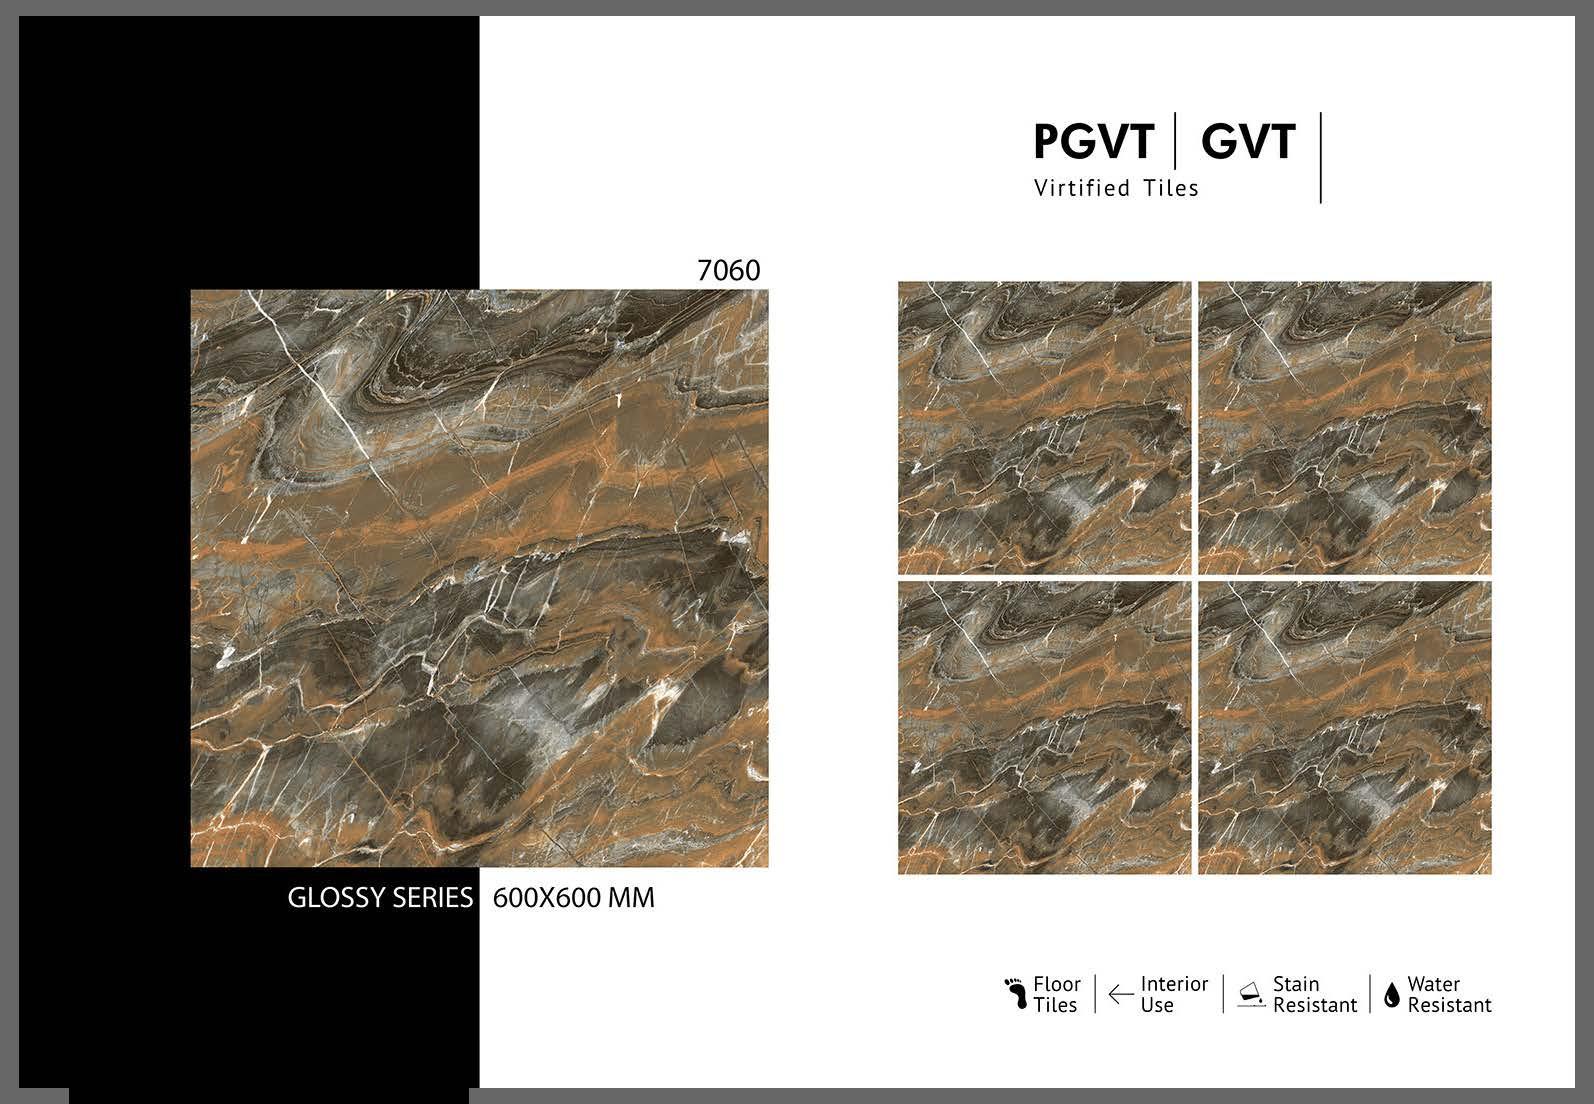 GVT 2X2 GLOSSY_Page_47.jpg